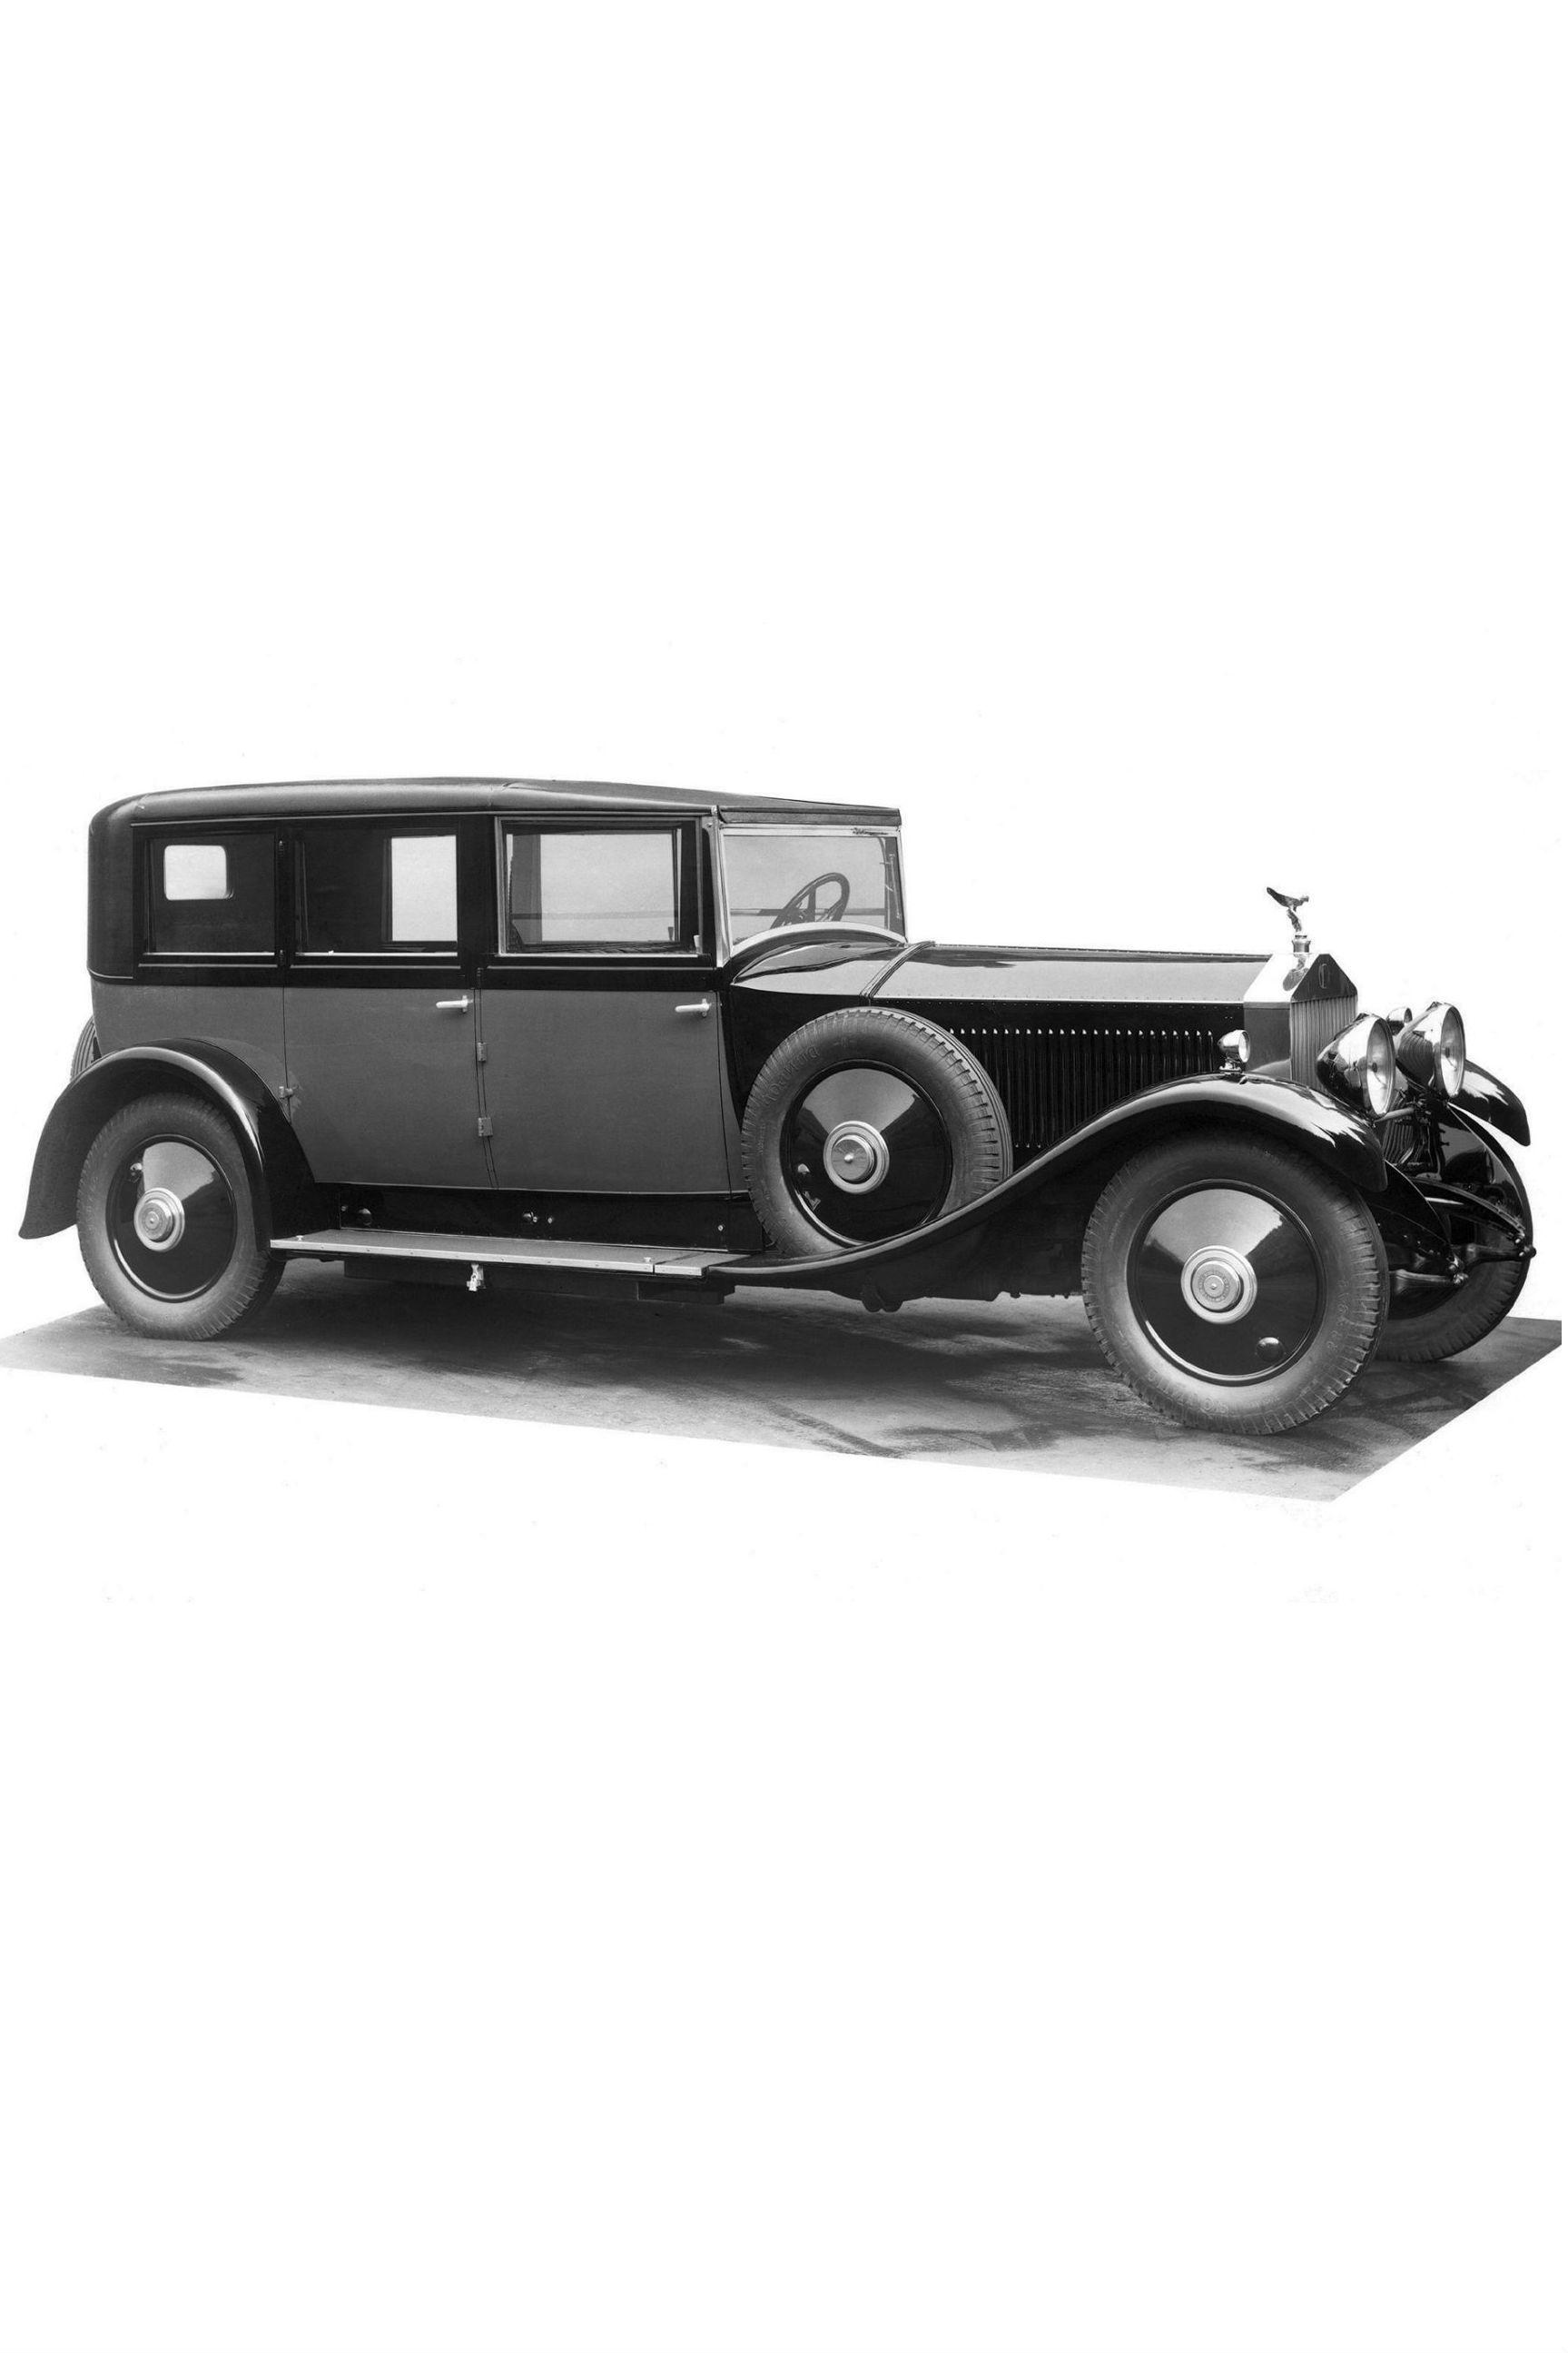 model t cost in 1925